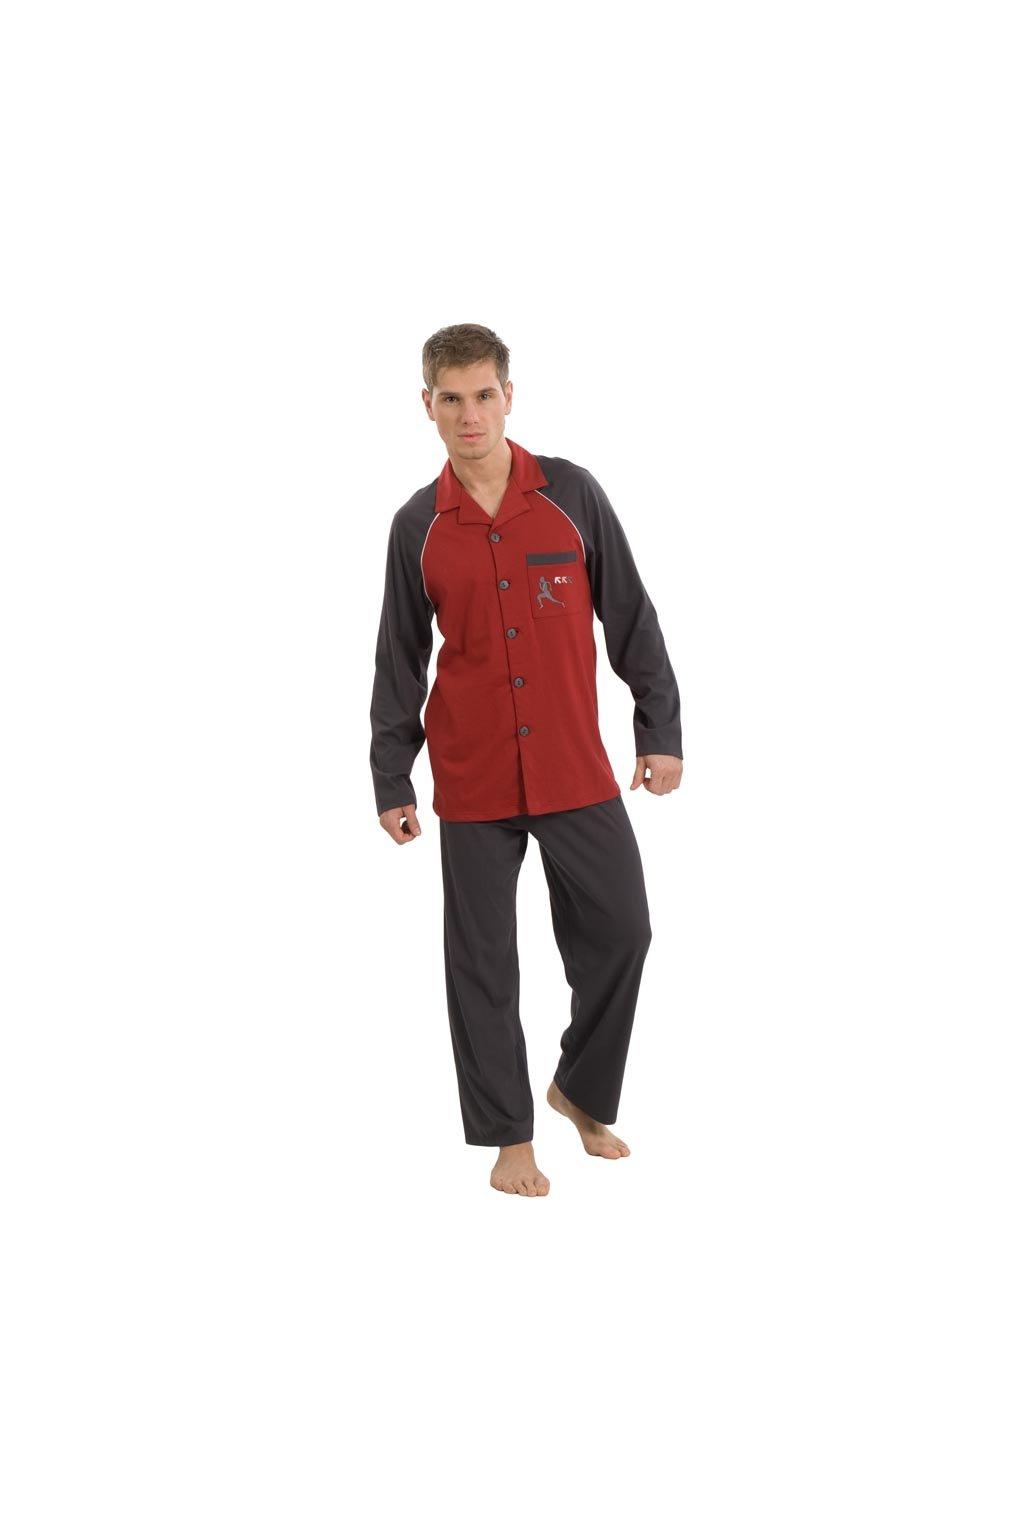 Pánské pyžamo s dlouhým rukávem, 20423 568, šedá